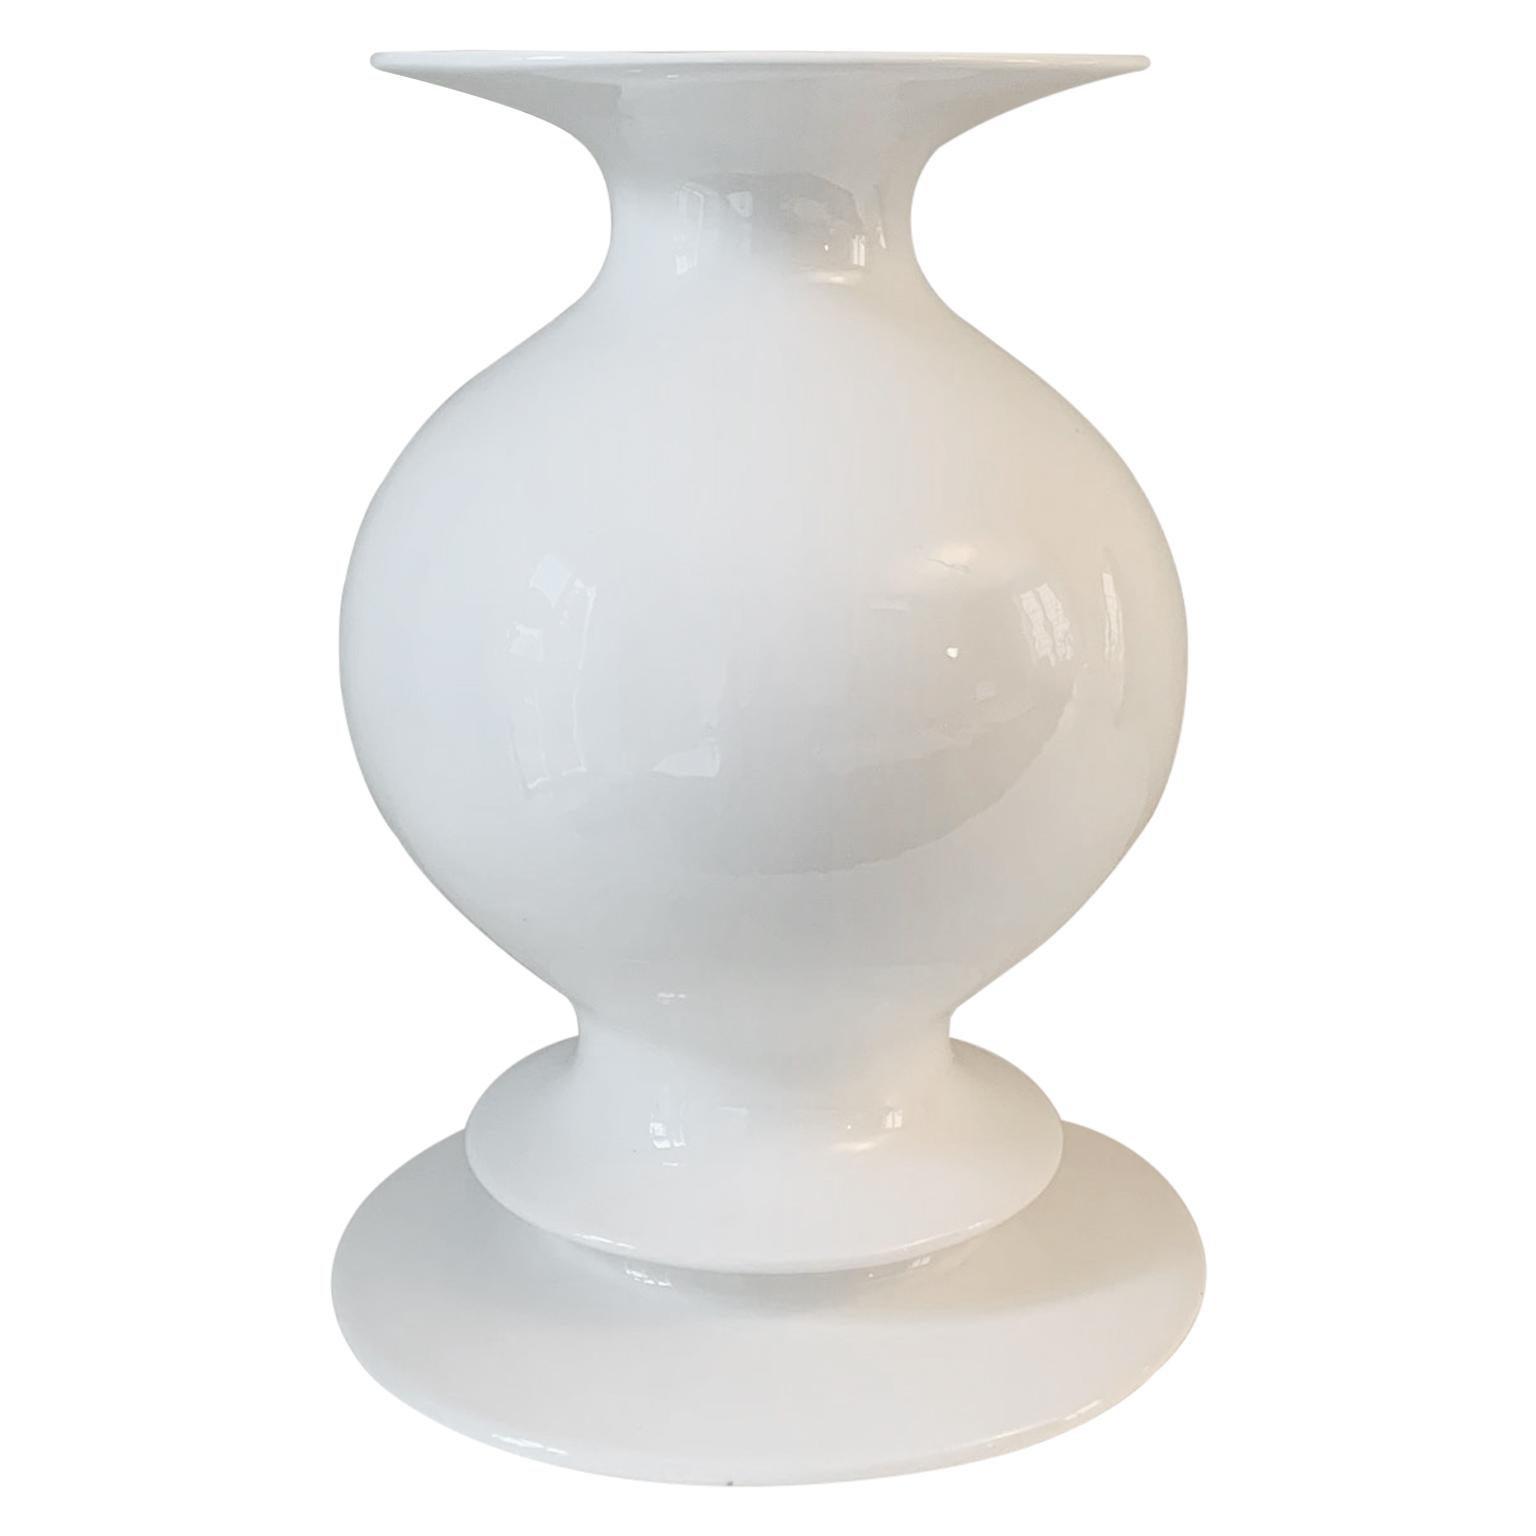 Vaso Bianco, Ceramic White Vase by Michele De Lucchi